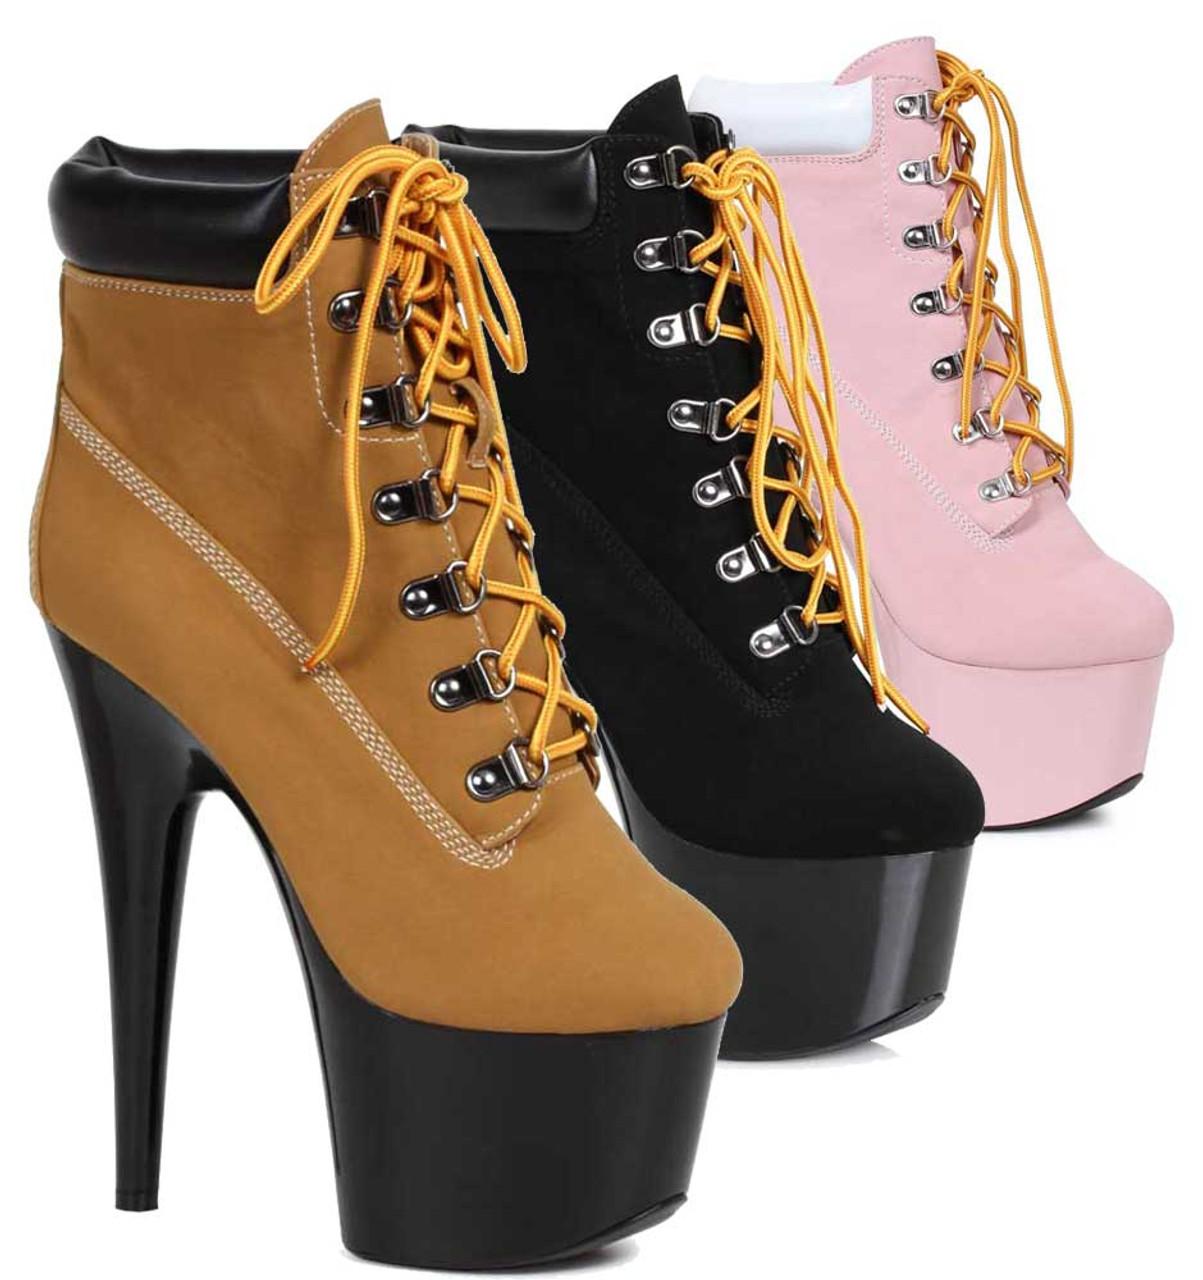 2b88c45df 7 Inch Lace up Ankle Boots | Ellie Shoes 709-Faith Color available: Black  ...